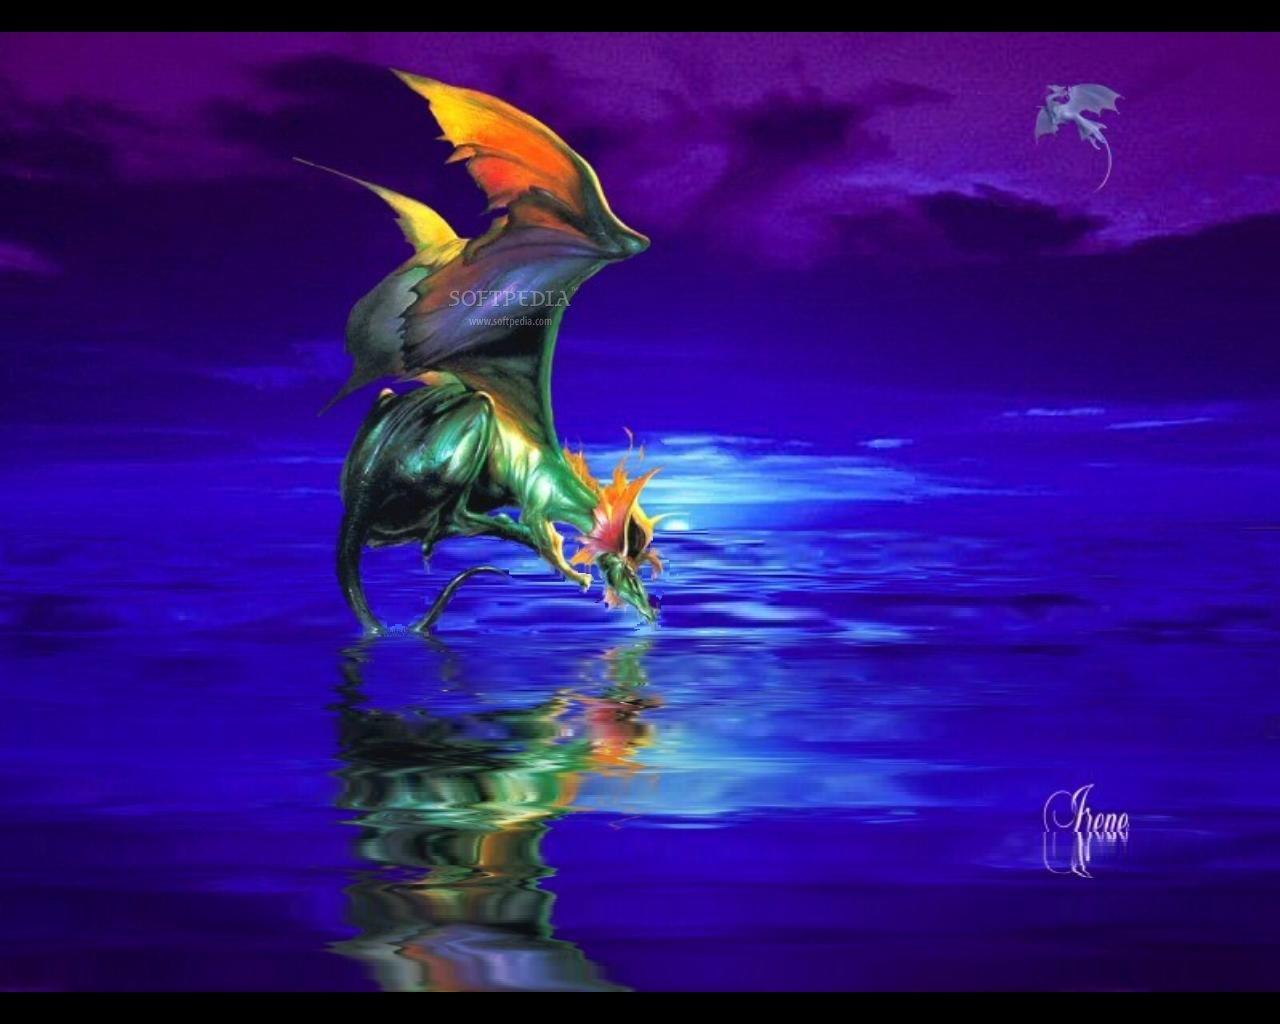 Pics Photos   Blue Dragon Screensaver Wallpaper Screensaver 1280x1024